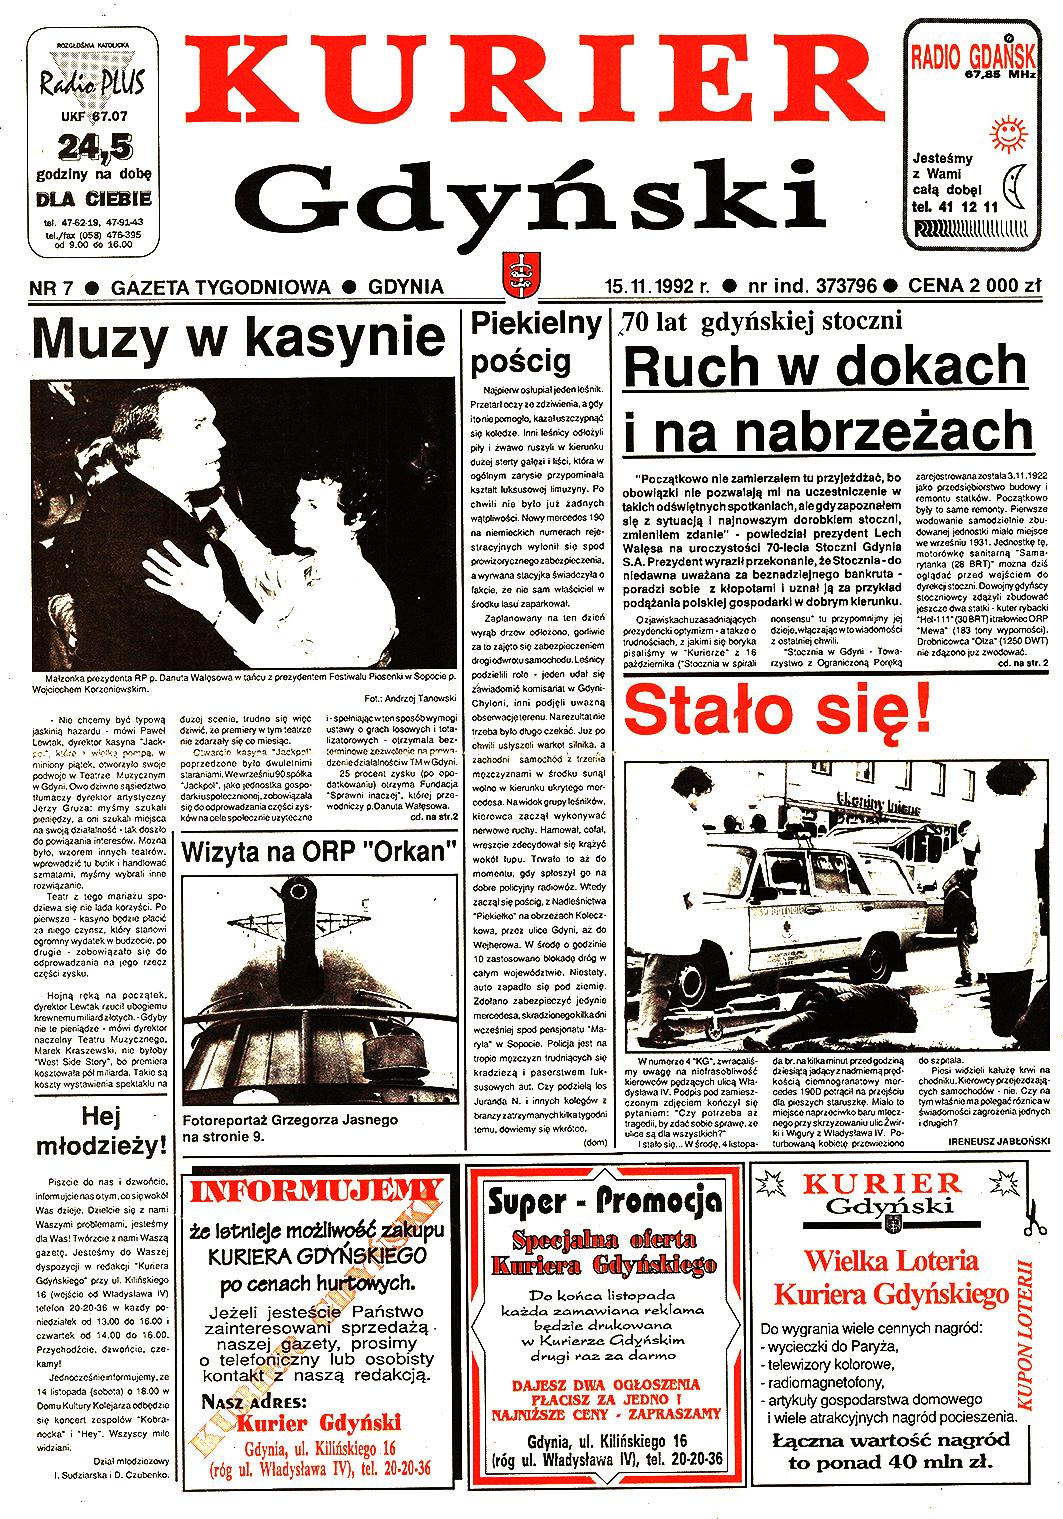 Kurier Gdyński. - 1992, nr 7